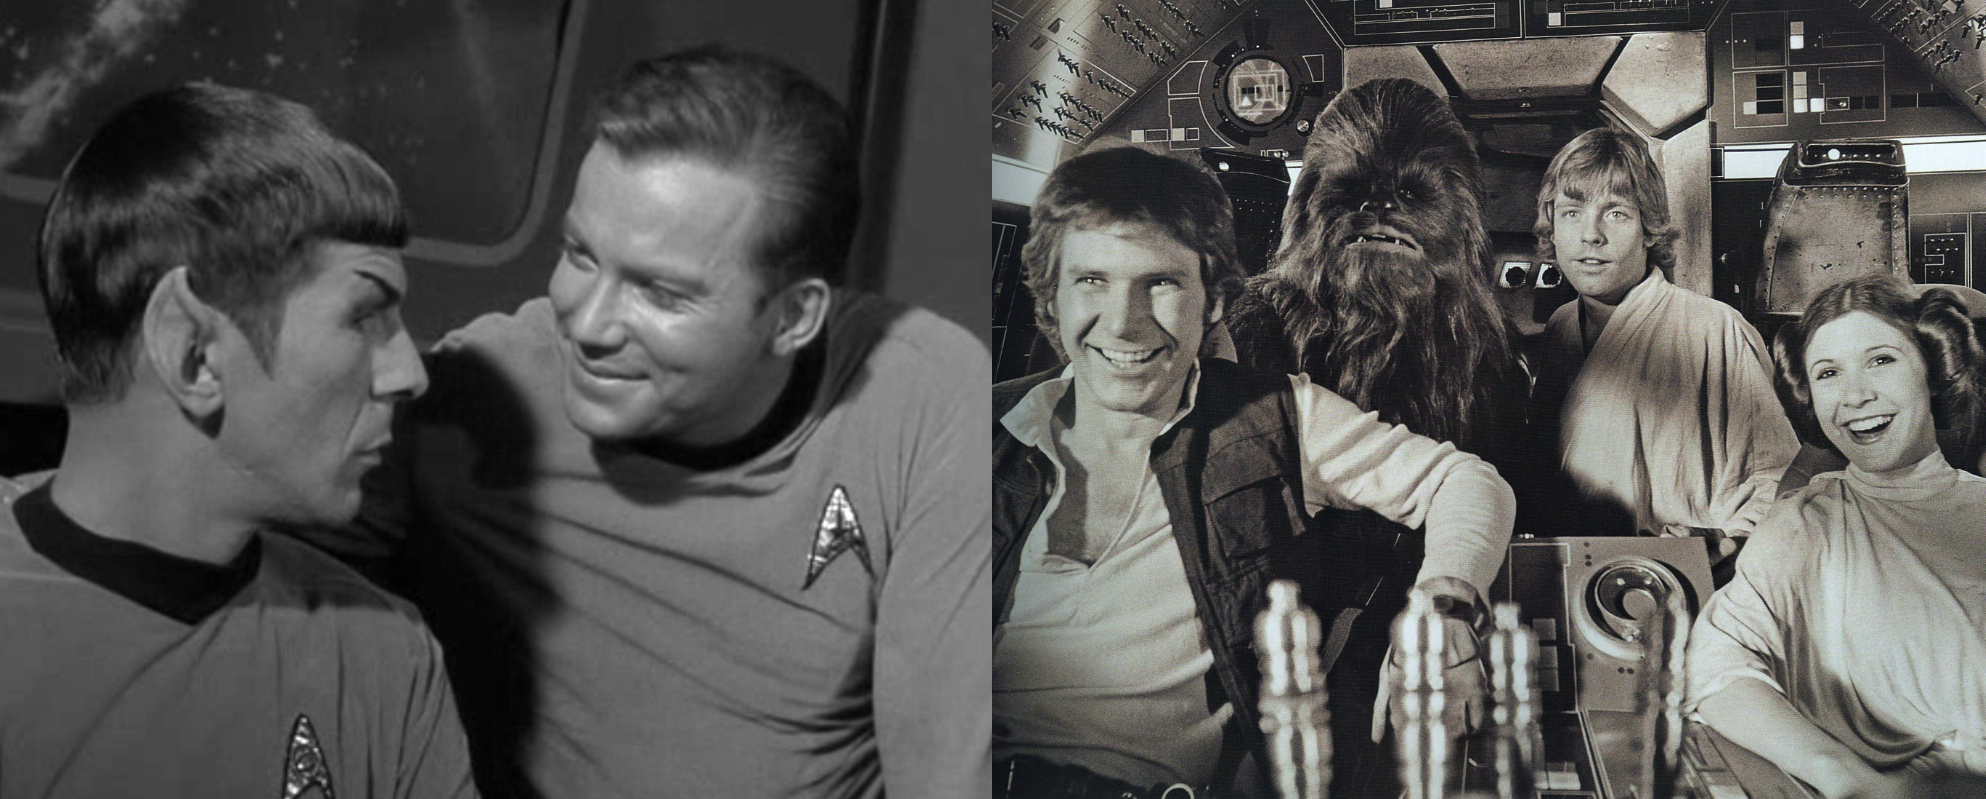 Star Trek's Kirk and Spock, Star Wars's Han Solo, Chewie, Luke, and Leia